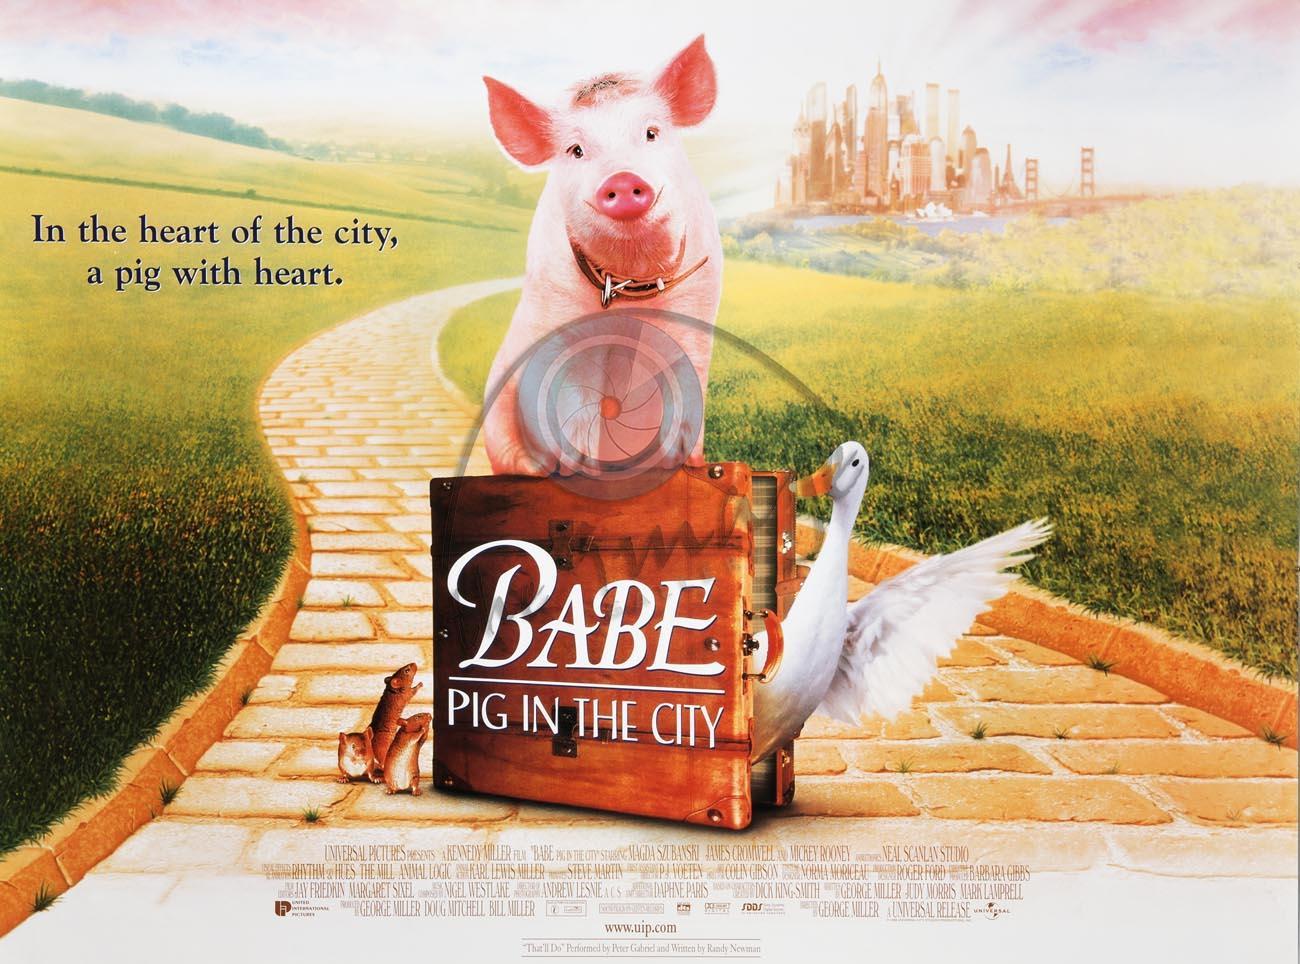 babe_pige_in_the_city_ukquad.jpg